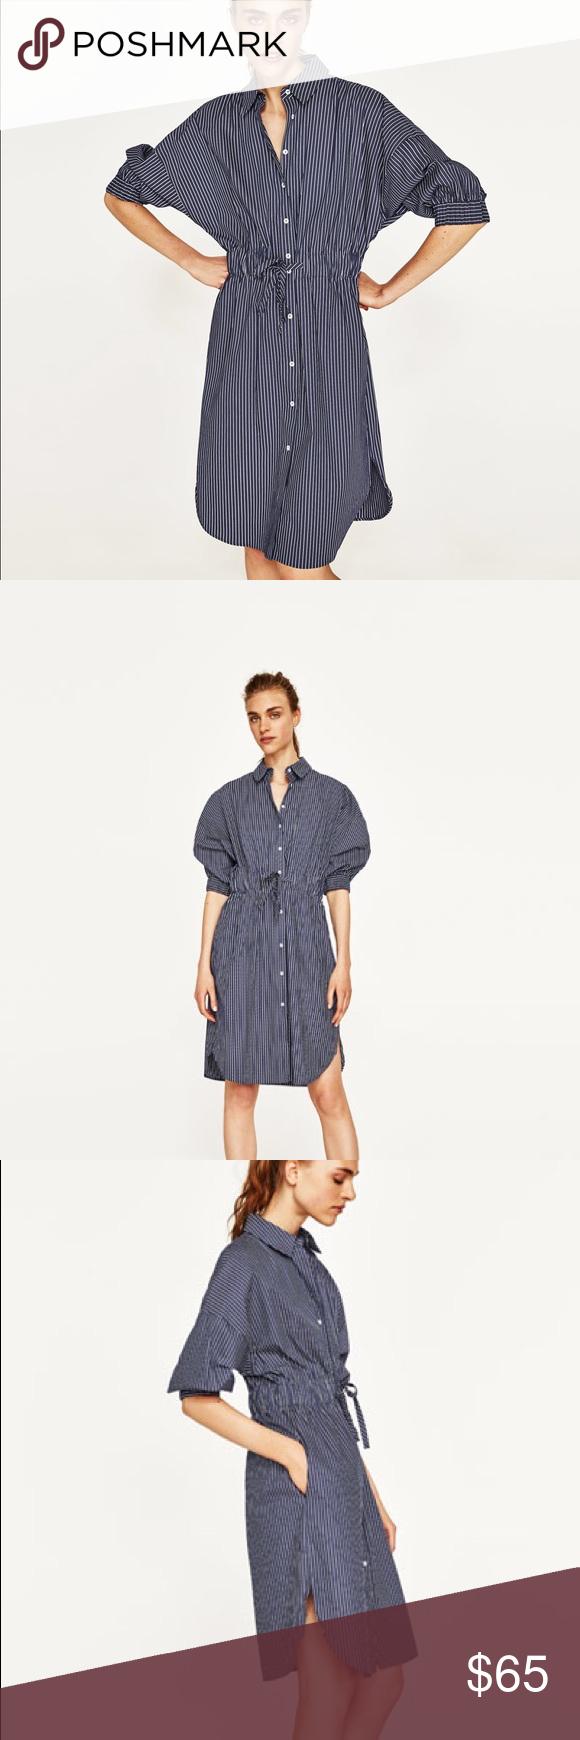 54dc812393 NWT Zara Blue and White Striped Shirt Dress Striped